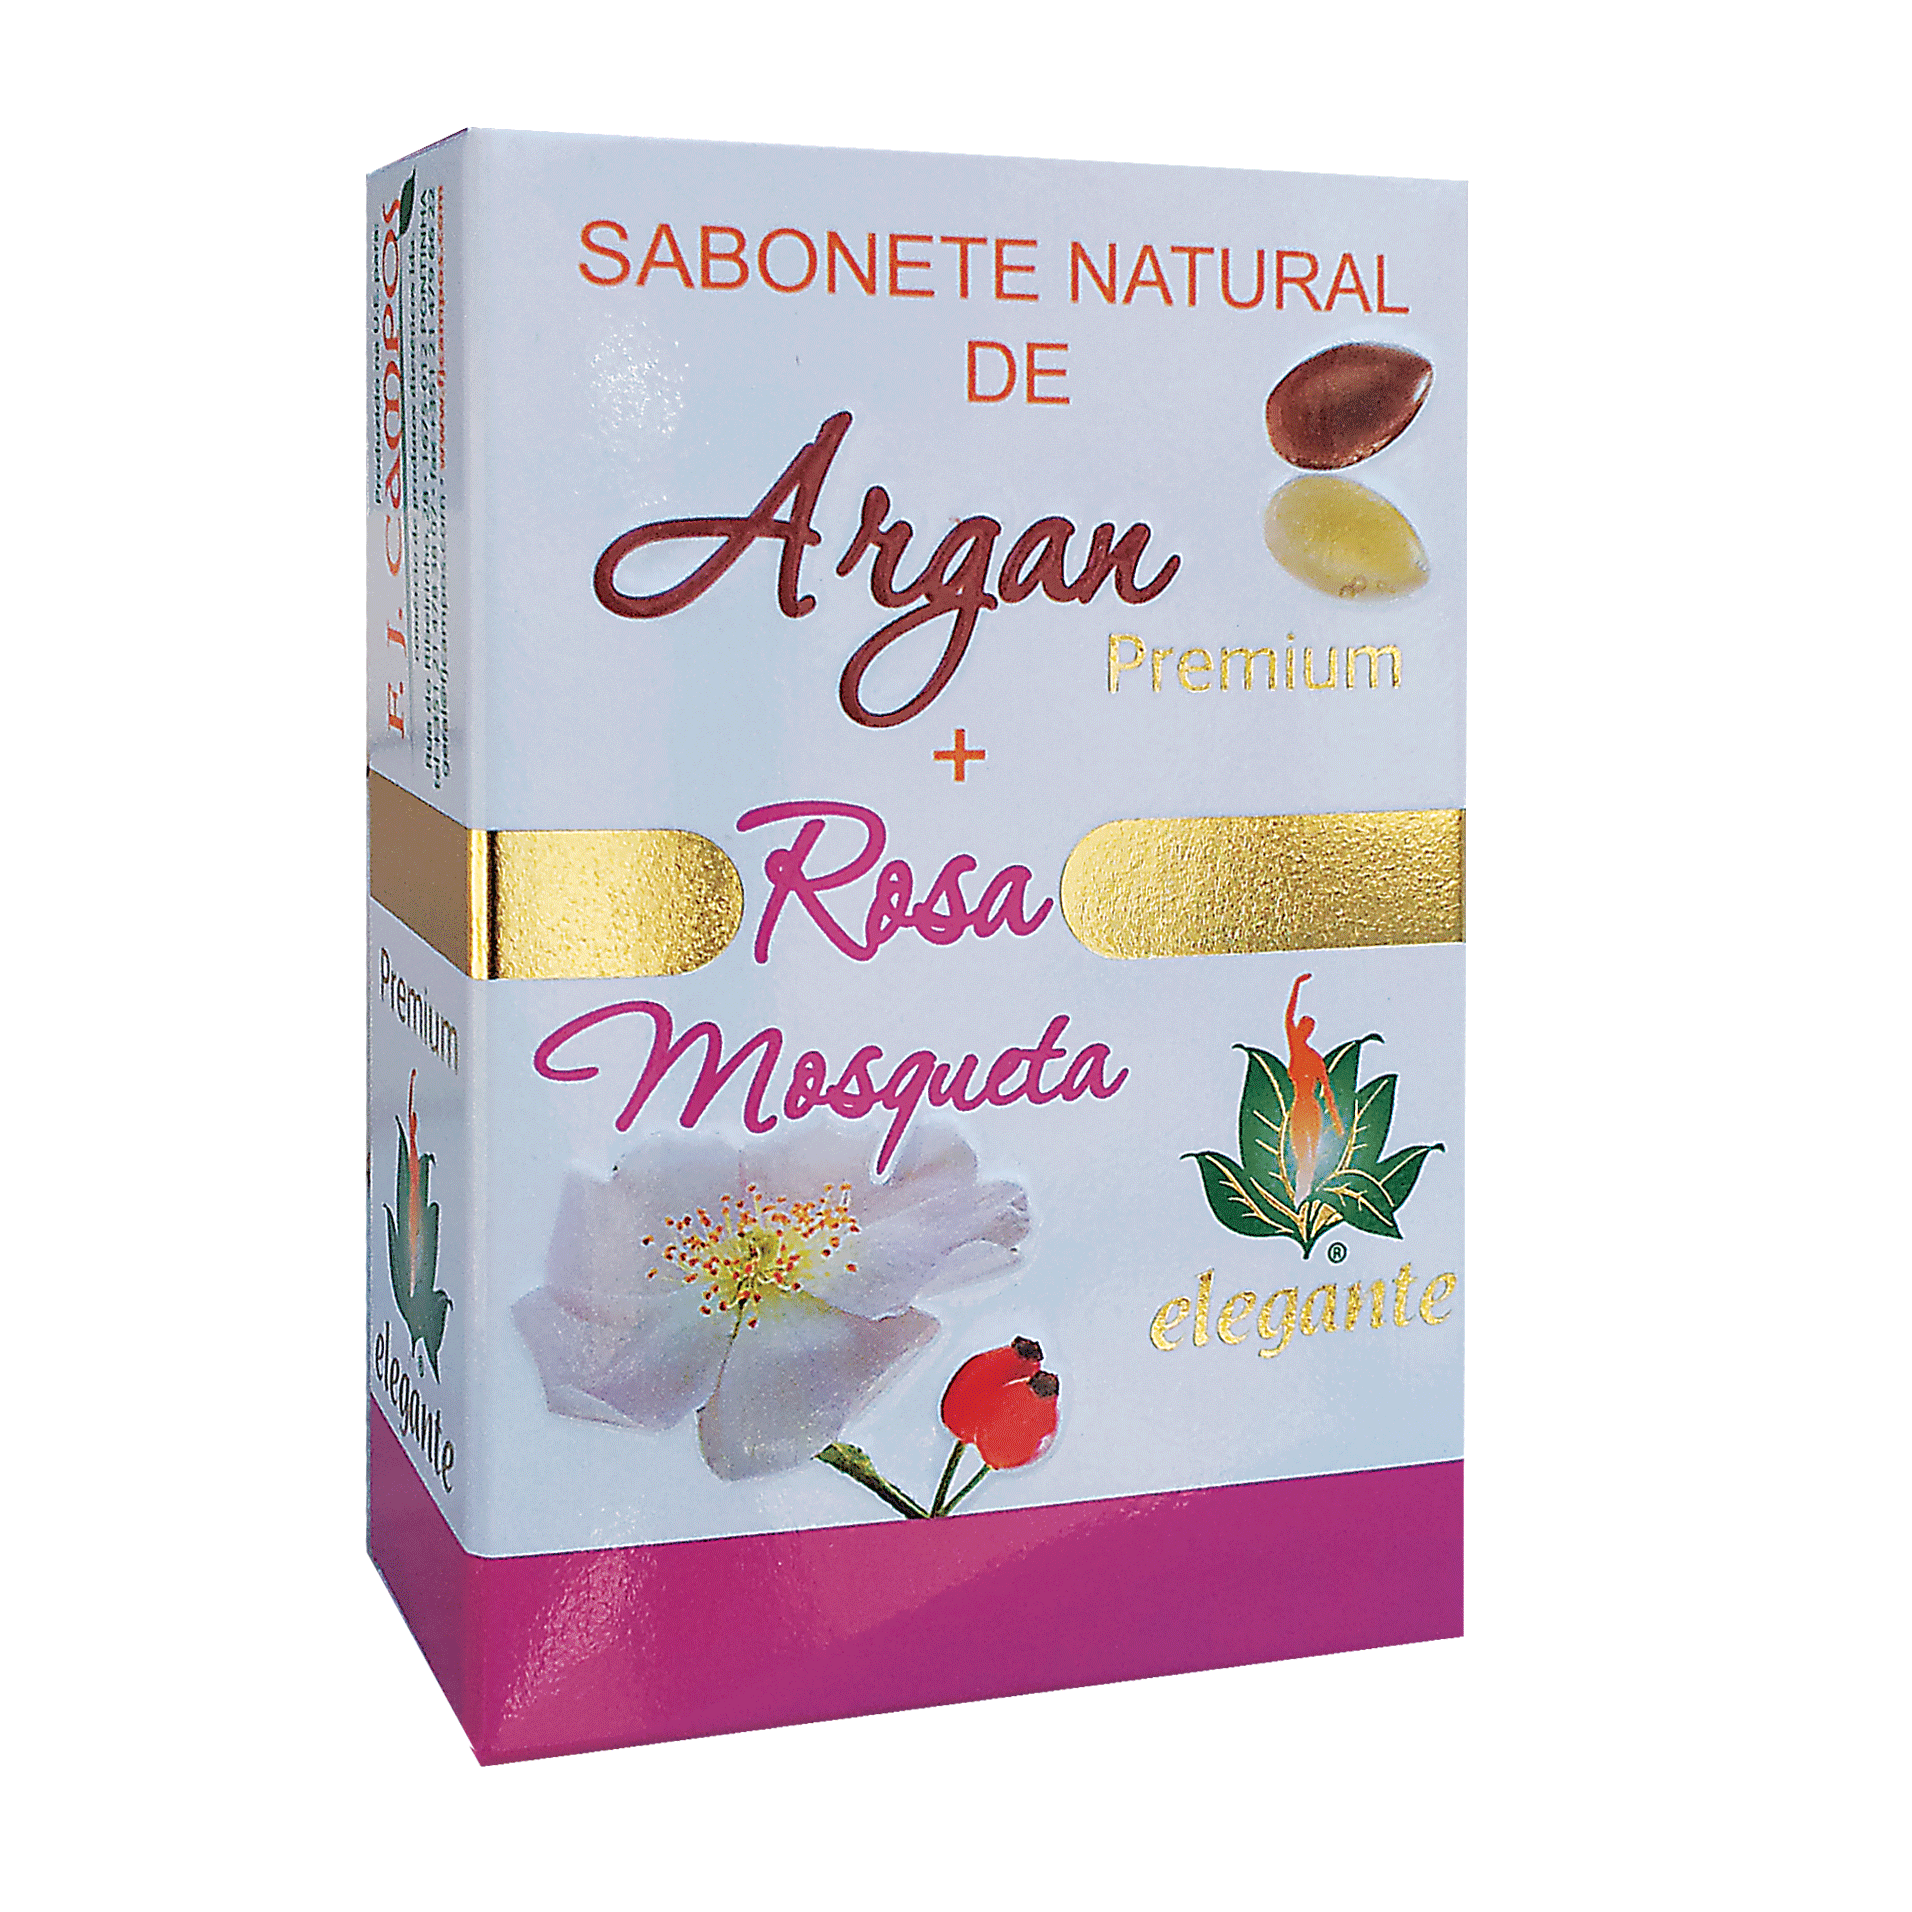 Sabonete Argan + Rosa Mosqueta PREMIUM